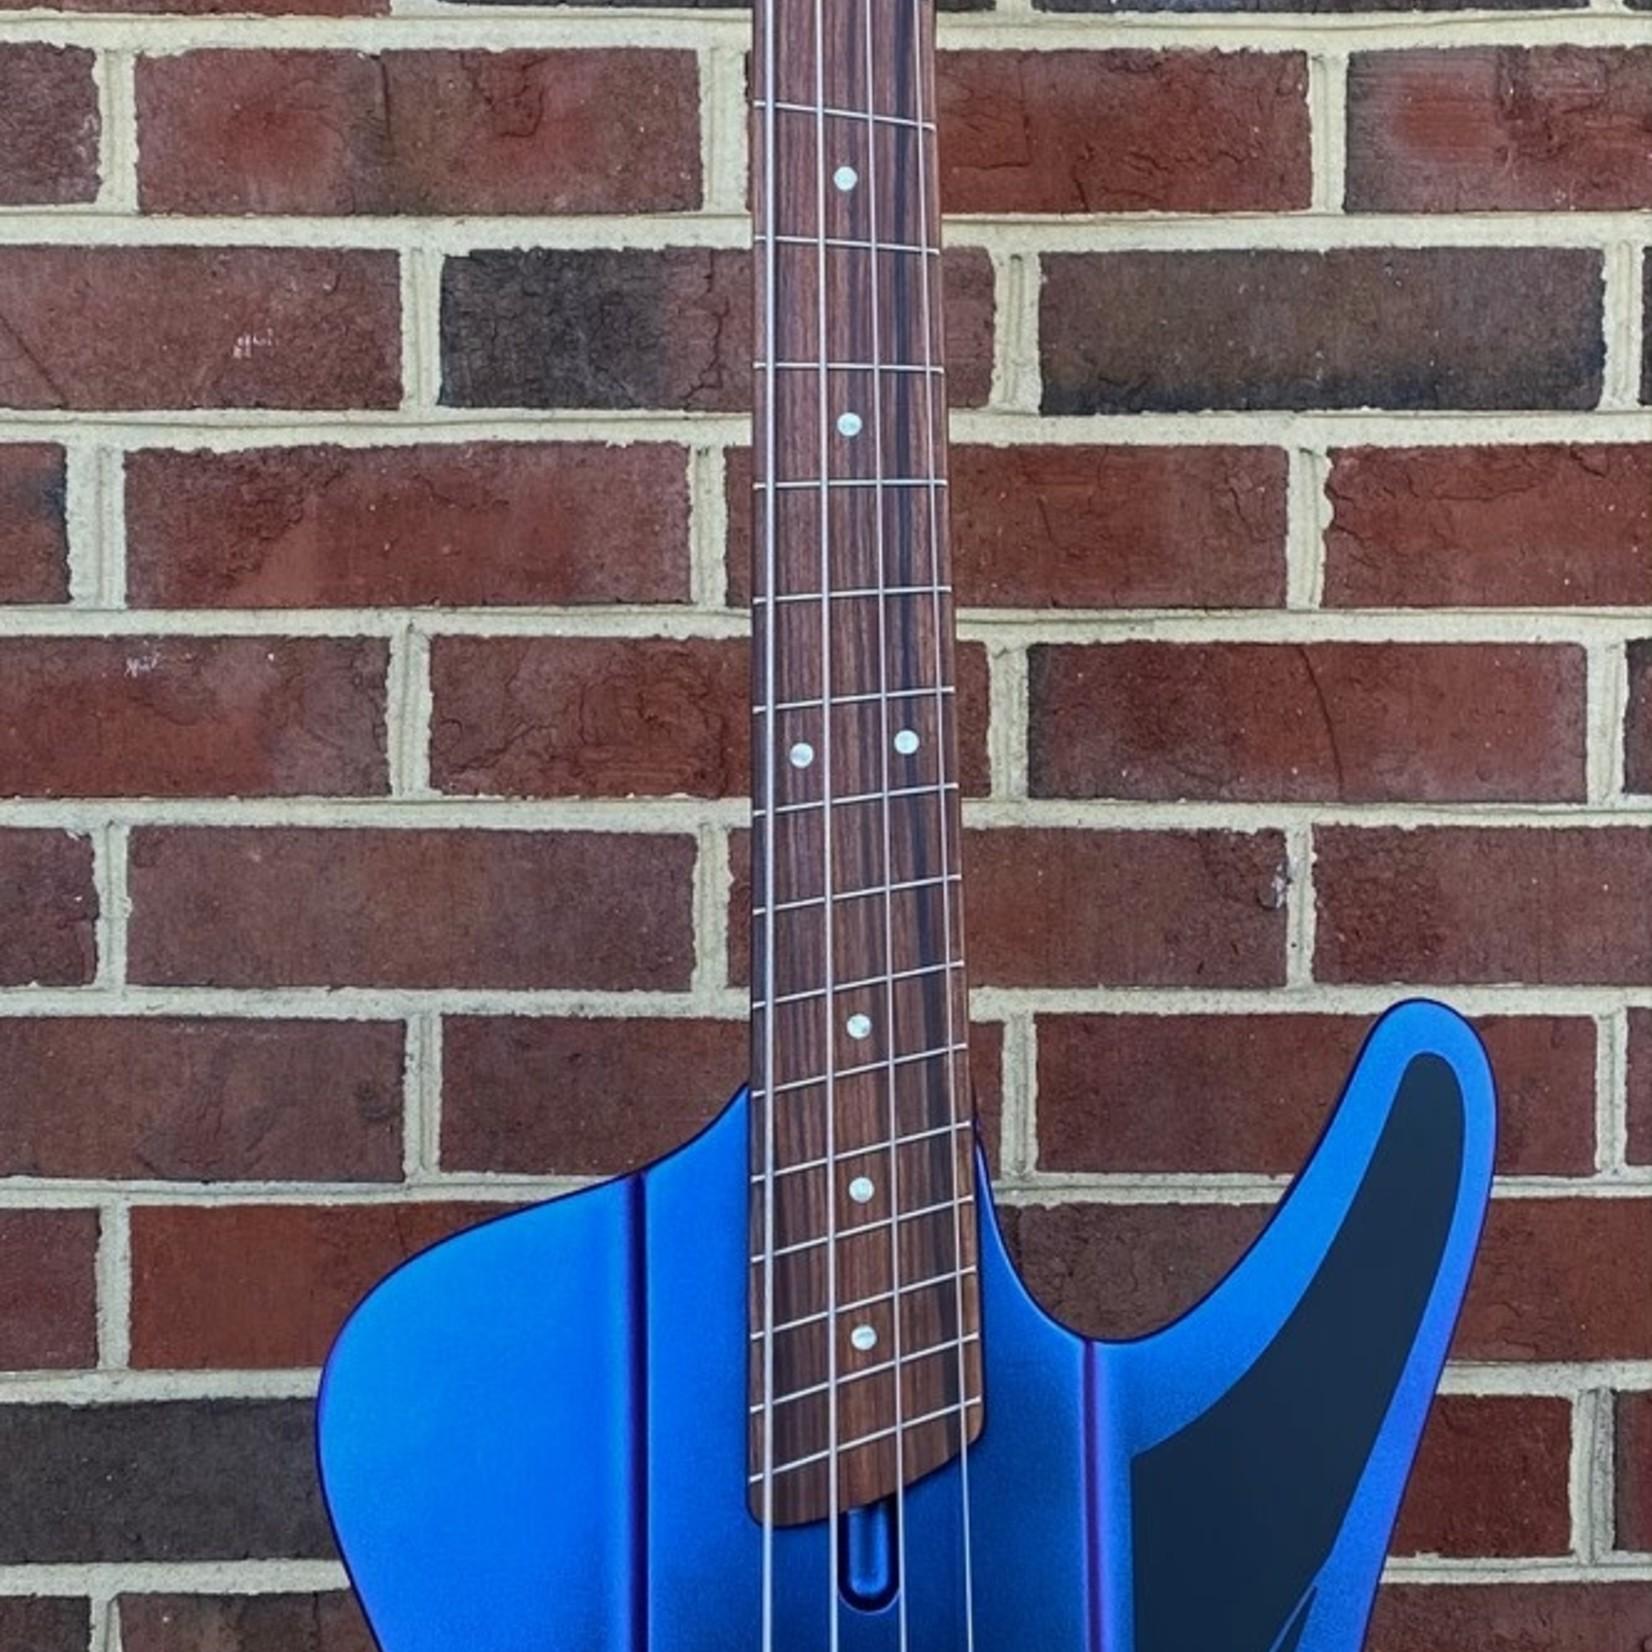 Dingwall Dingwall D-Roc Standard, Pau Ferro Fretboard, Blue to Purple Colorshift, Dingwall Gig Bag, SN# 7689